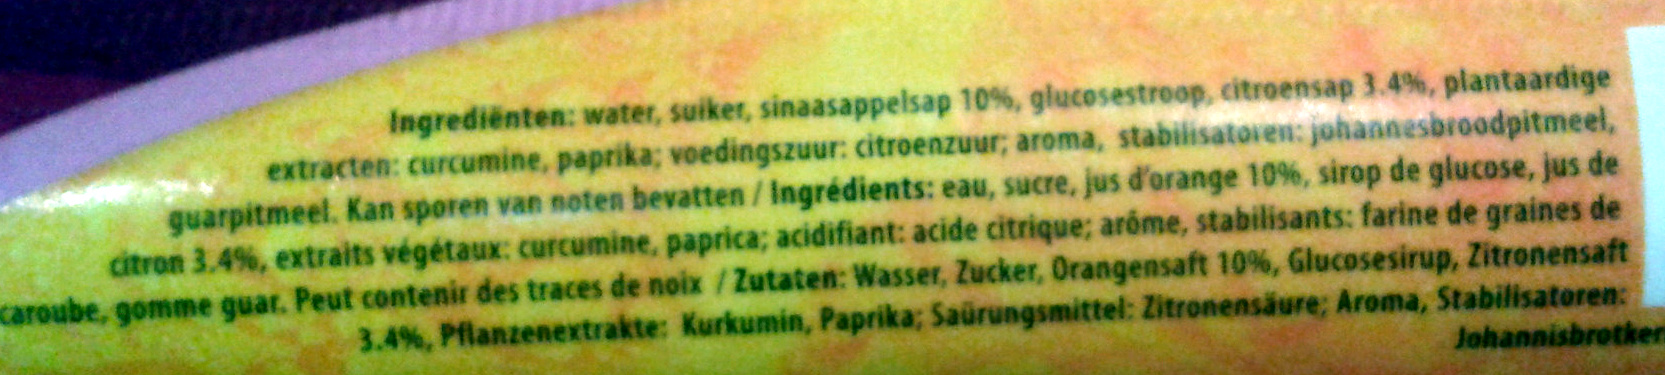 Linzato - Ingrediënten